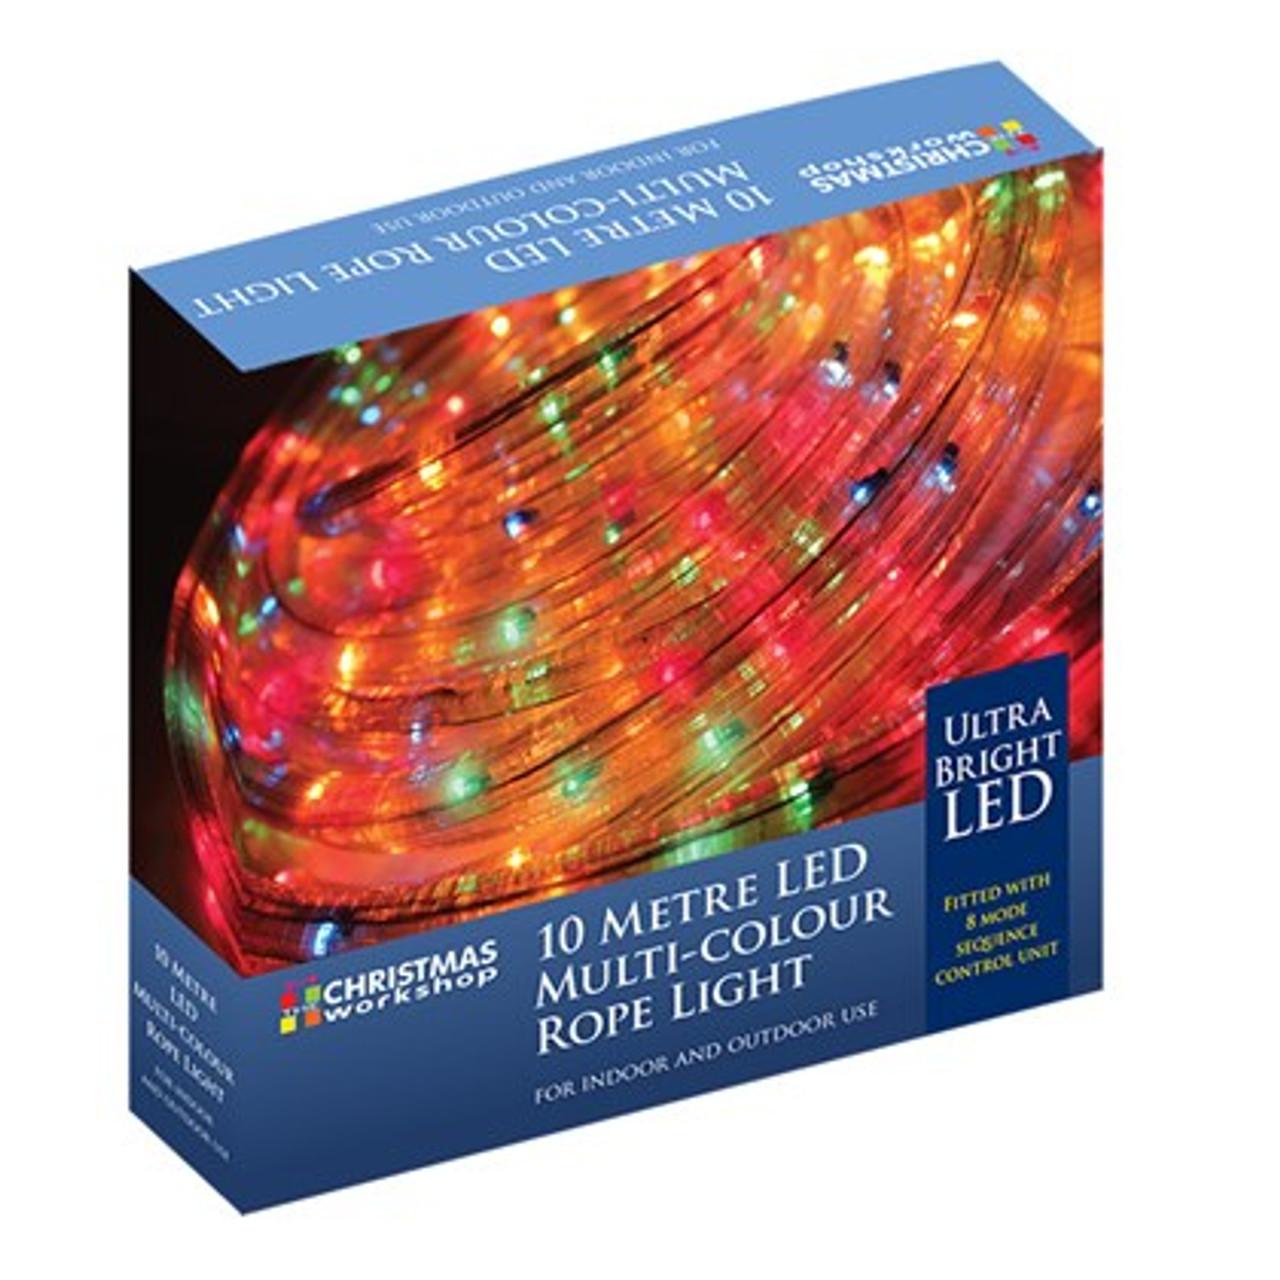 10M LED Multi-Coloured Rope Light